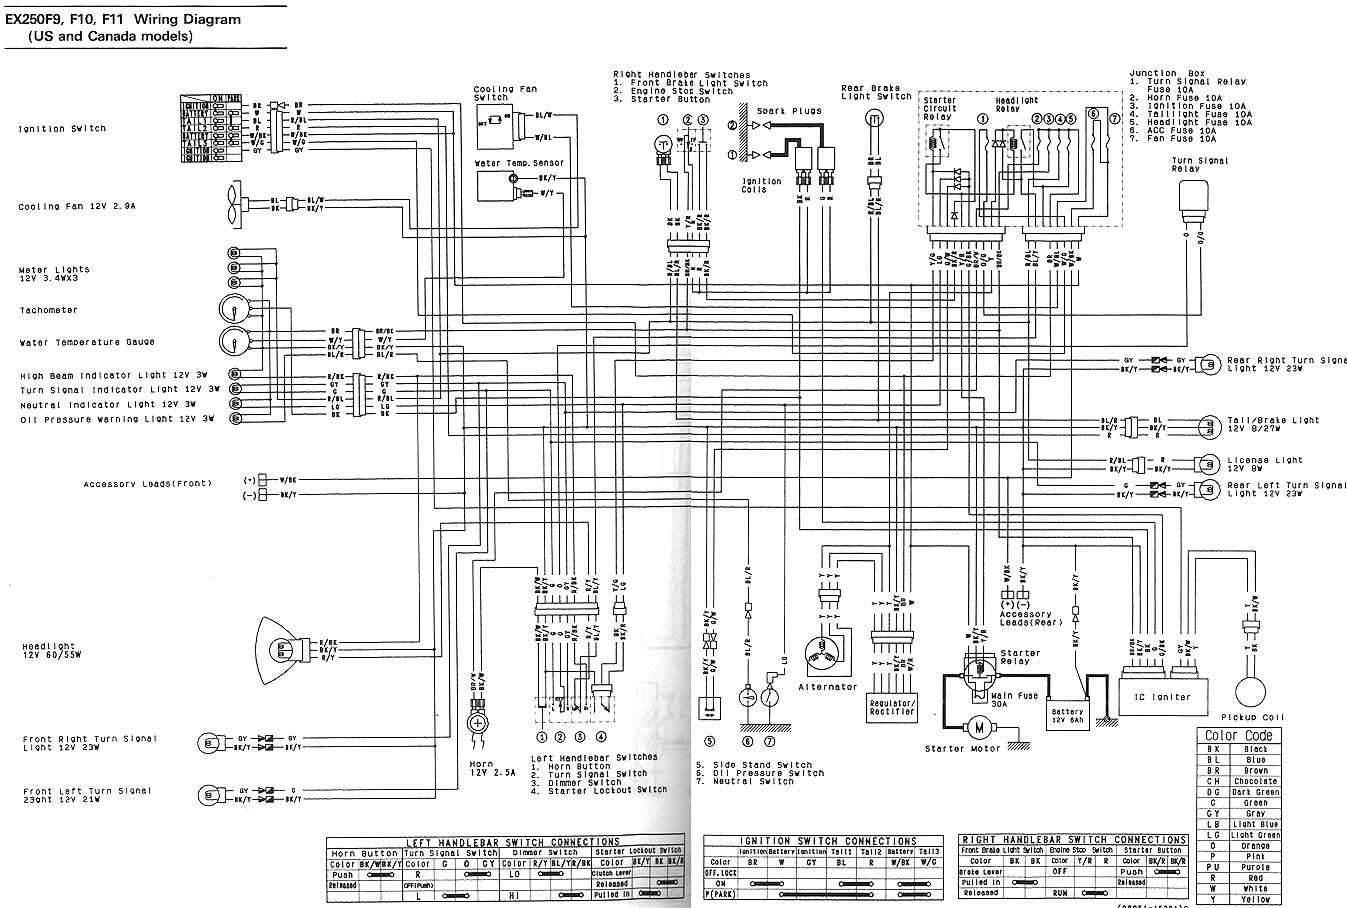 Wiring Diagram Details For 2012 Kawasaki 650r   Avecdd Unix on